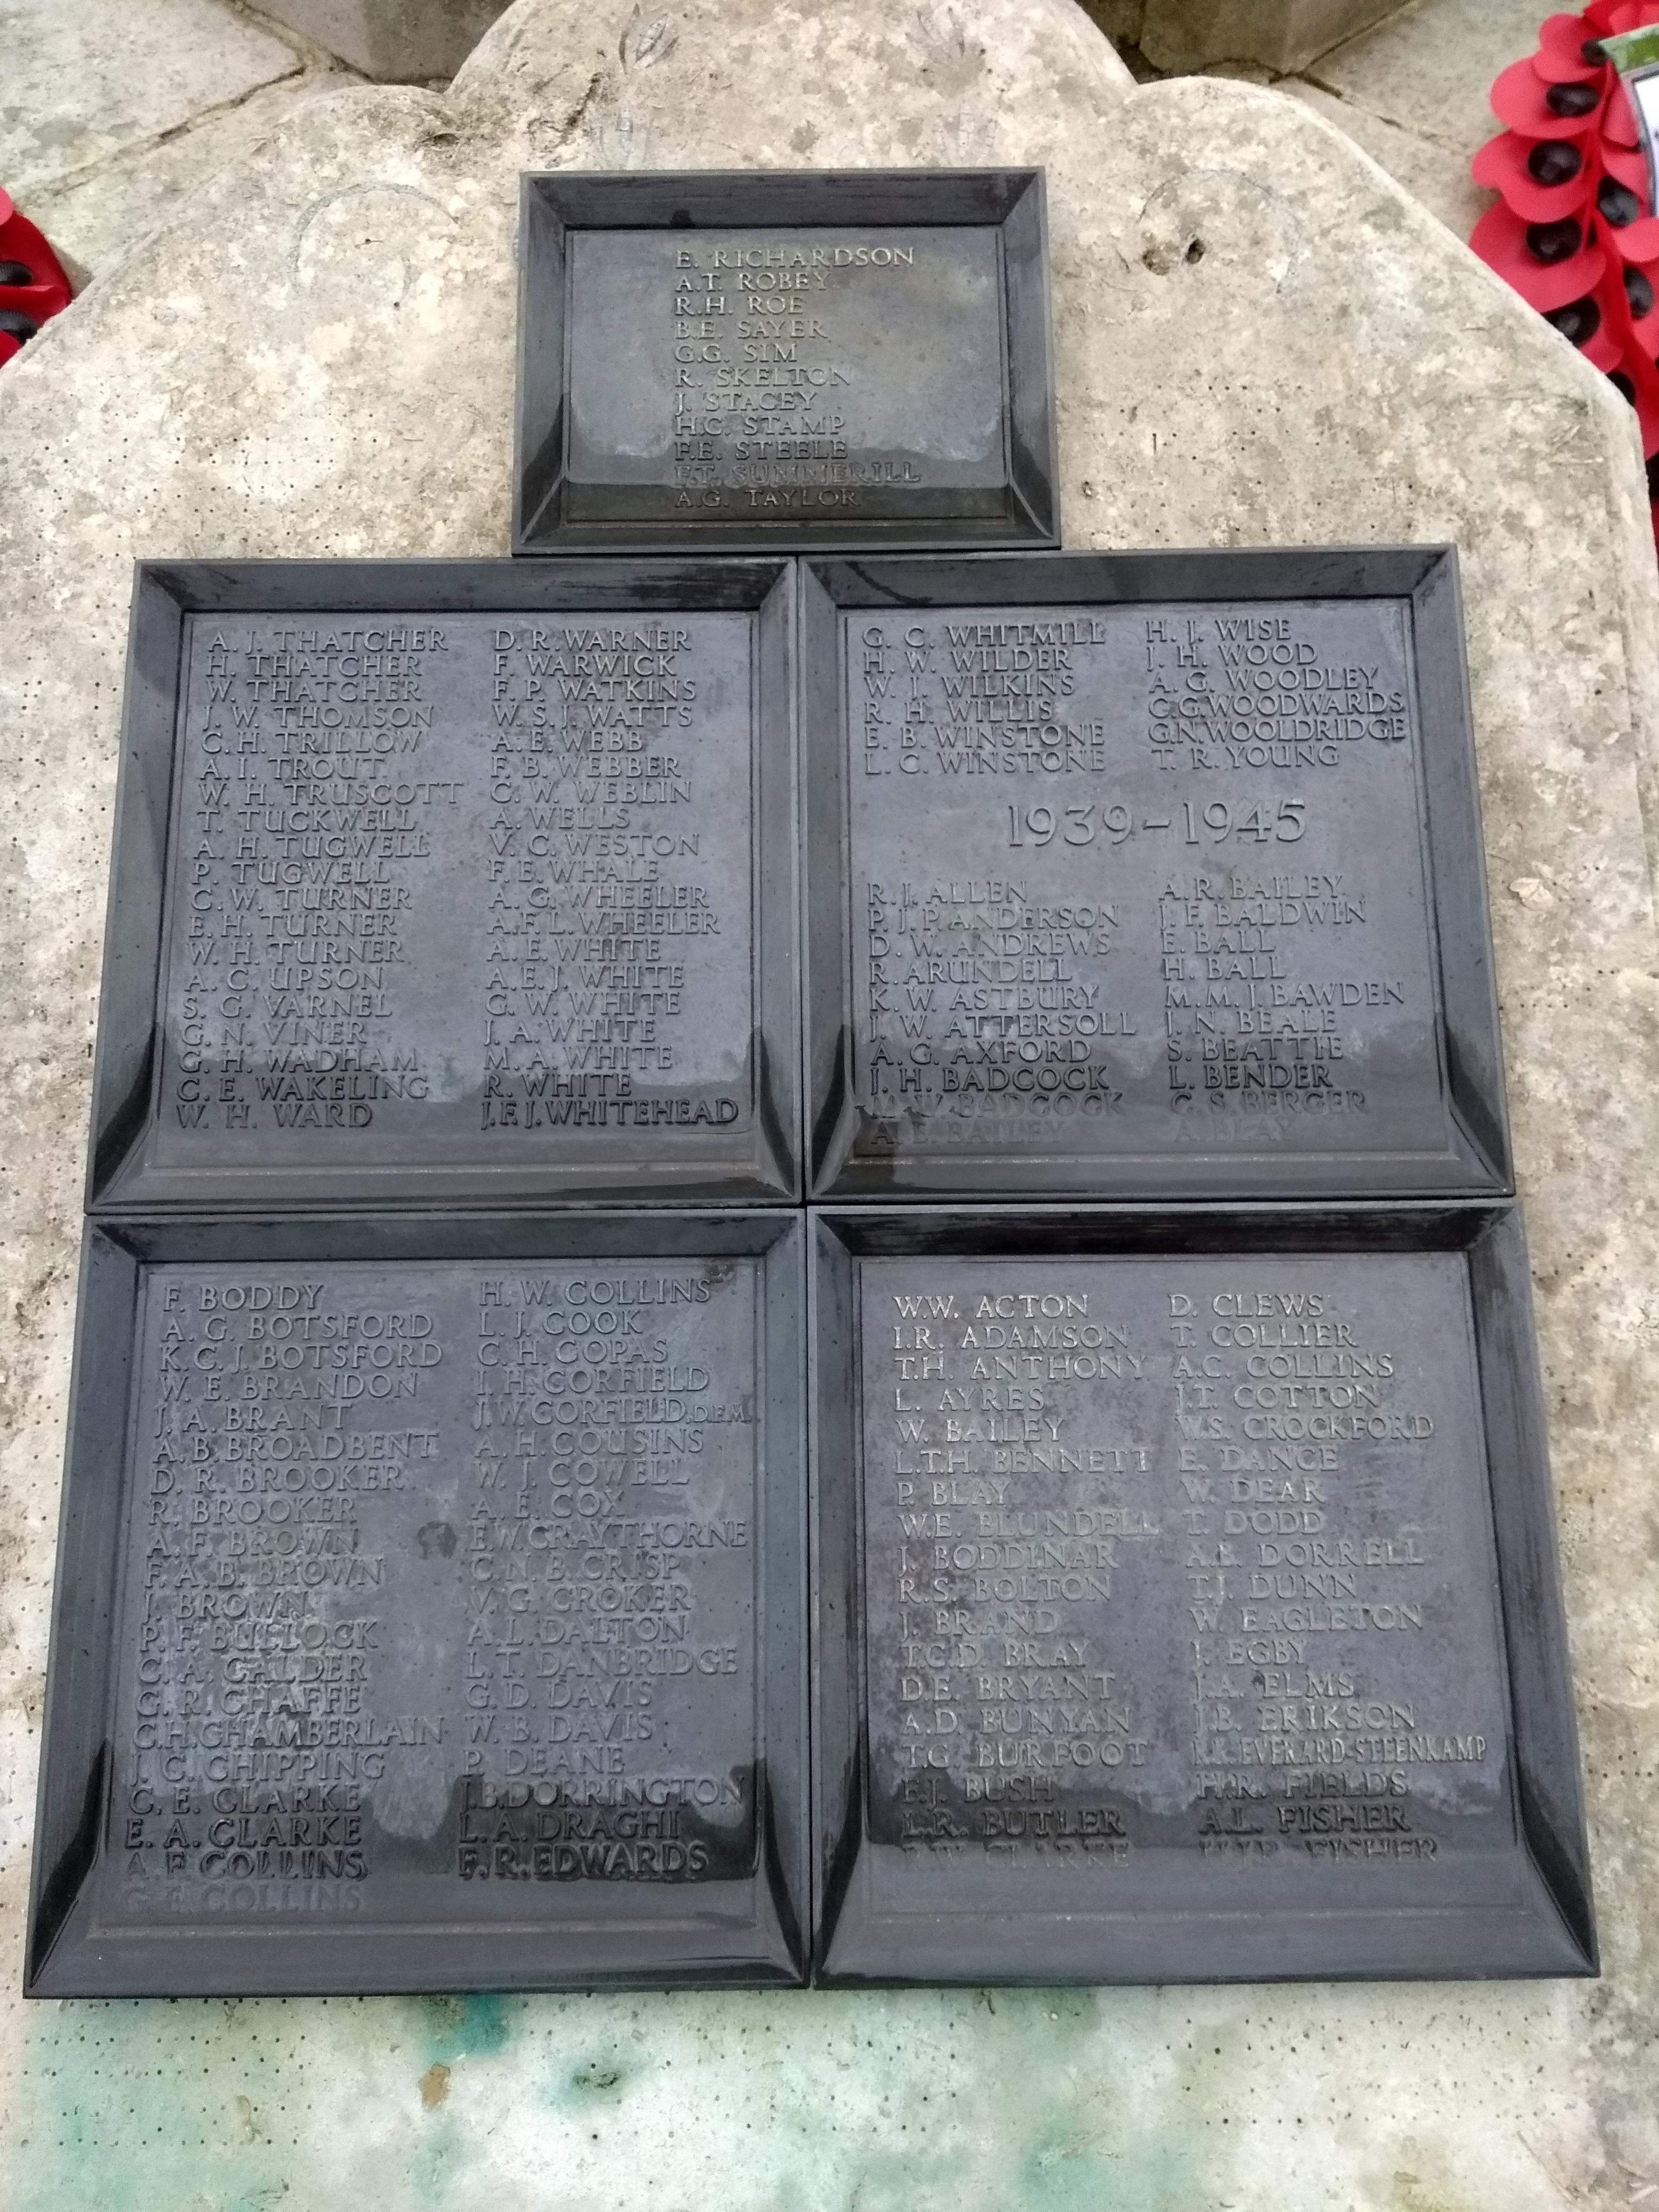 World War 1 and 2 Memorial - names of the fallen